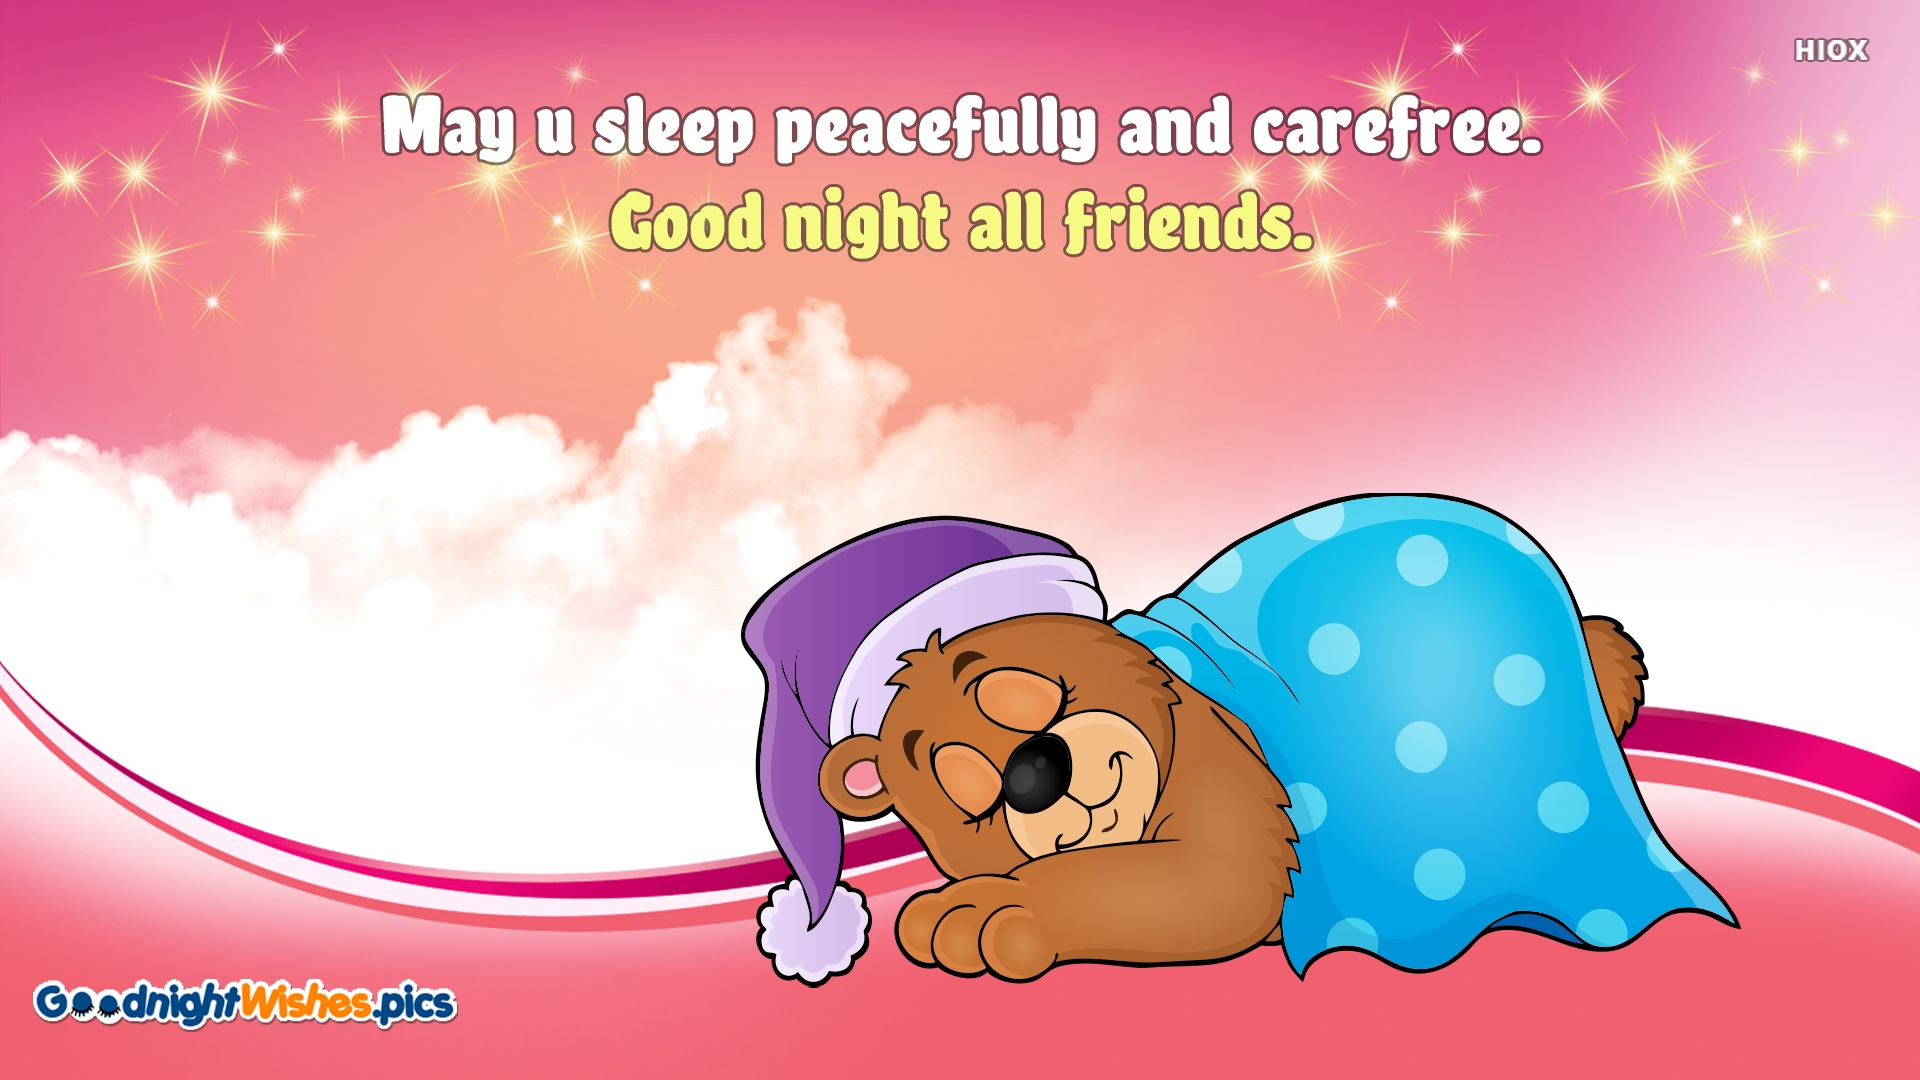 May U Sleep Peacefully and Carefree. Good Night All Friends.